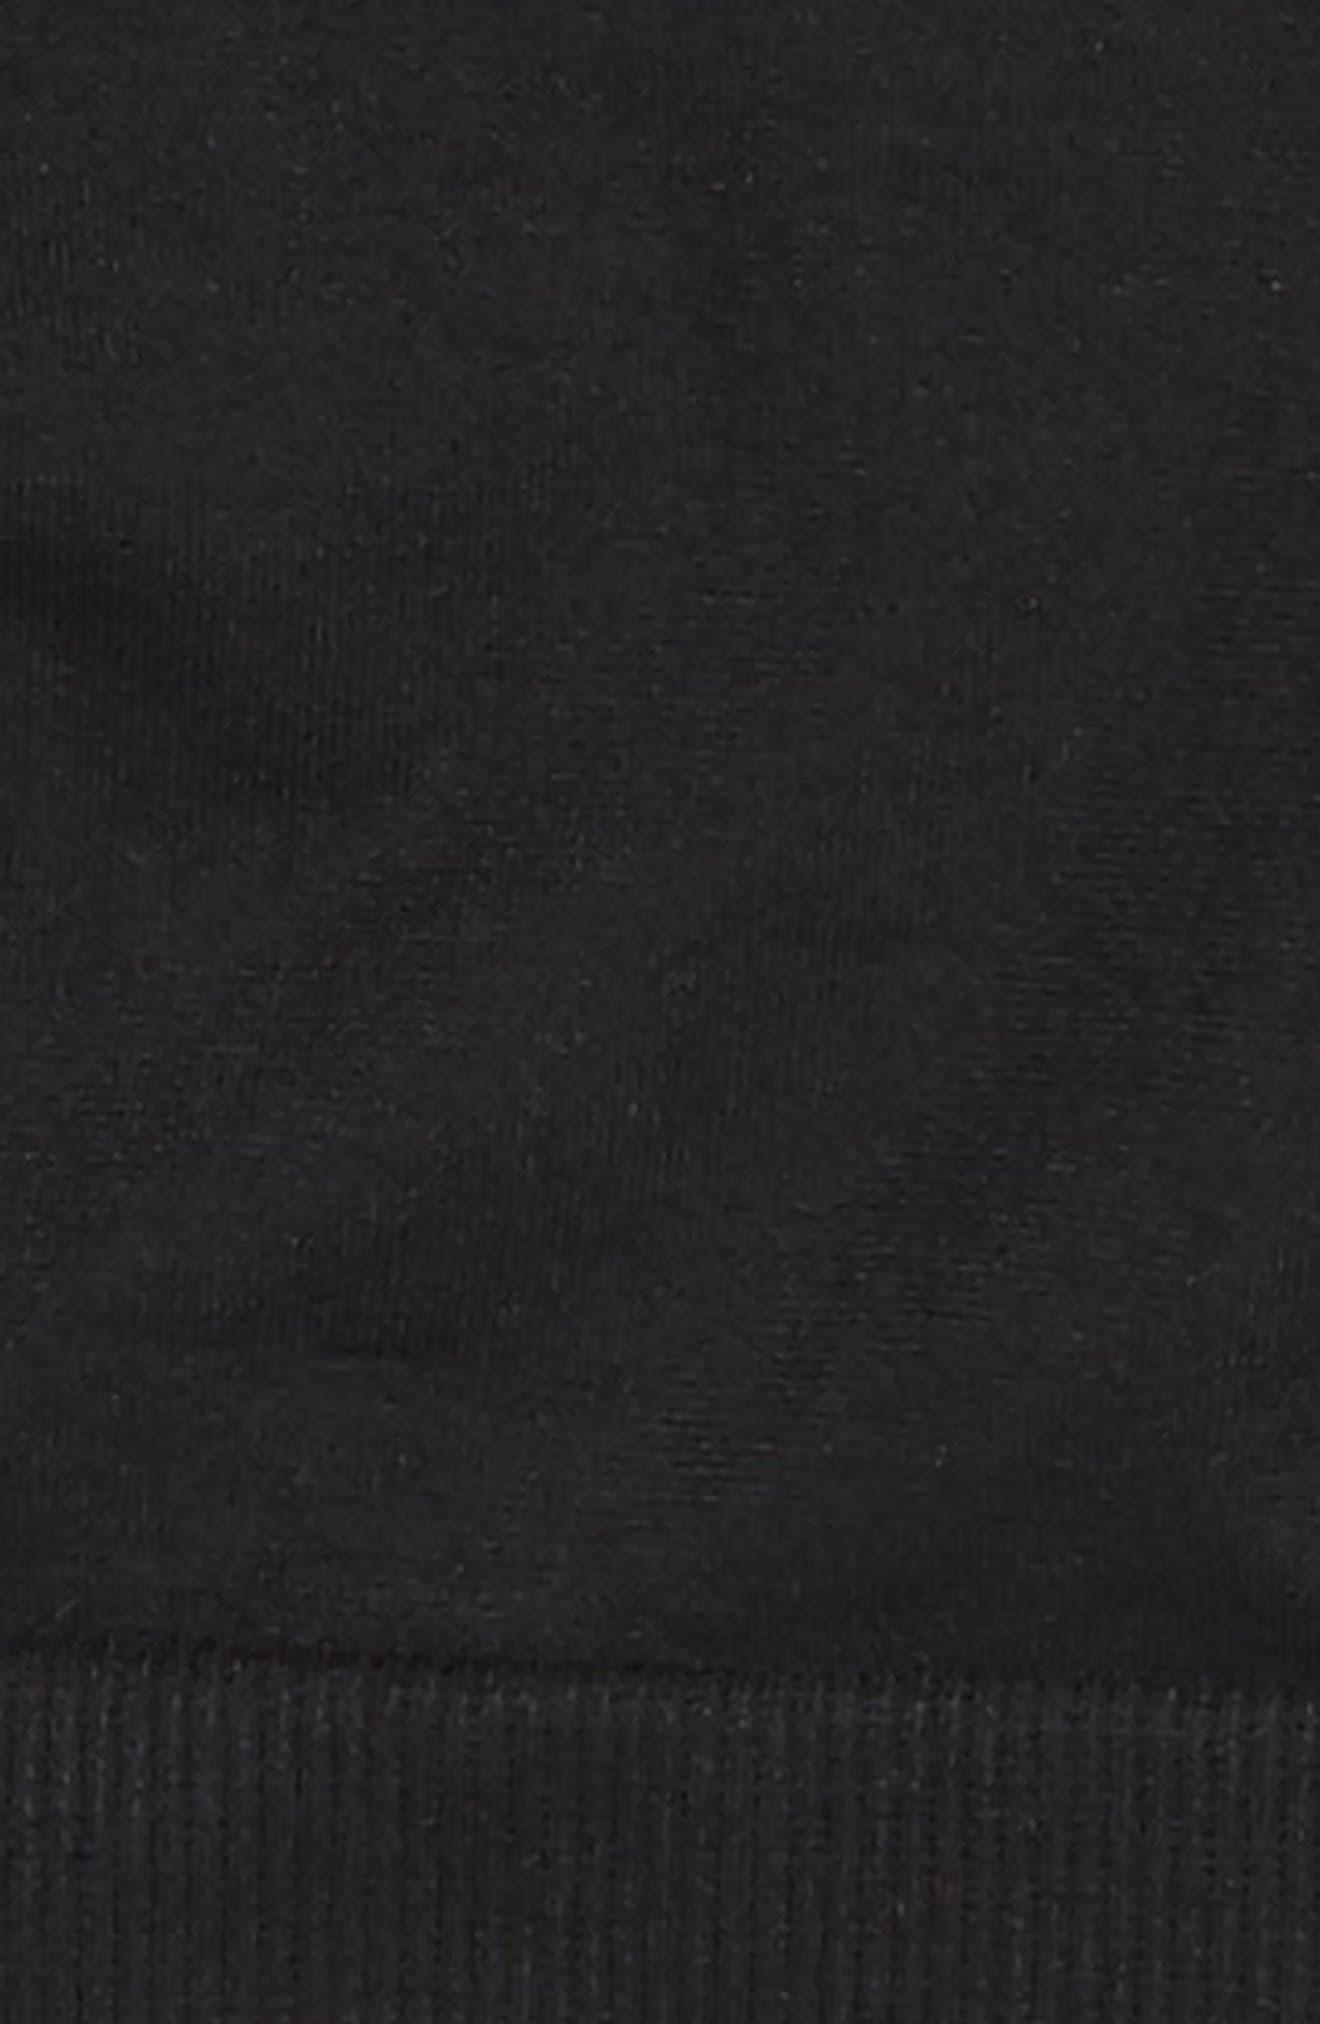 Strappy Bralette,                             Alternate thumbnail 2, color,                             BLACK